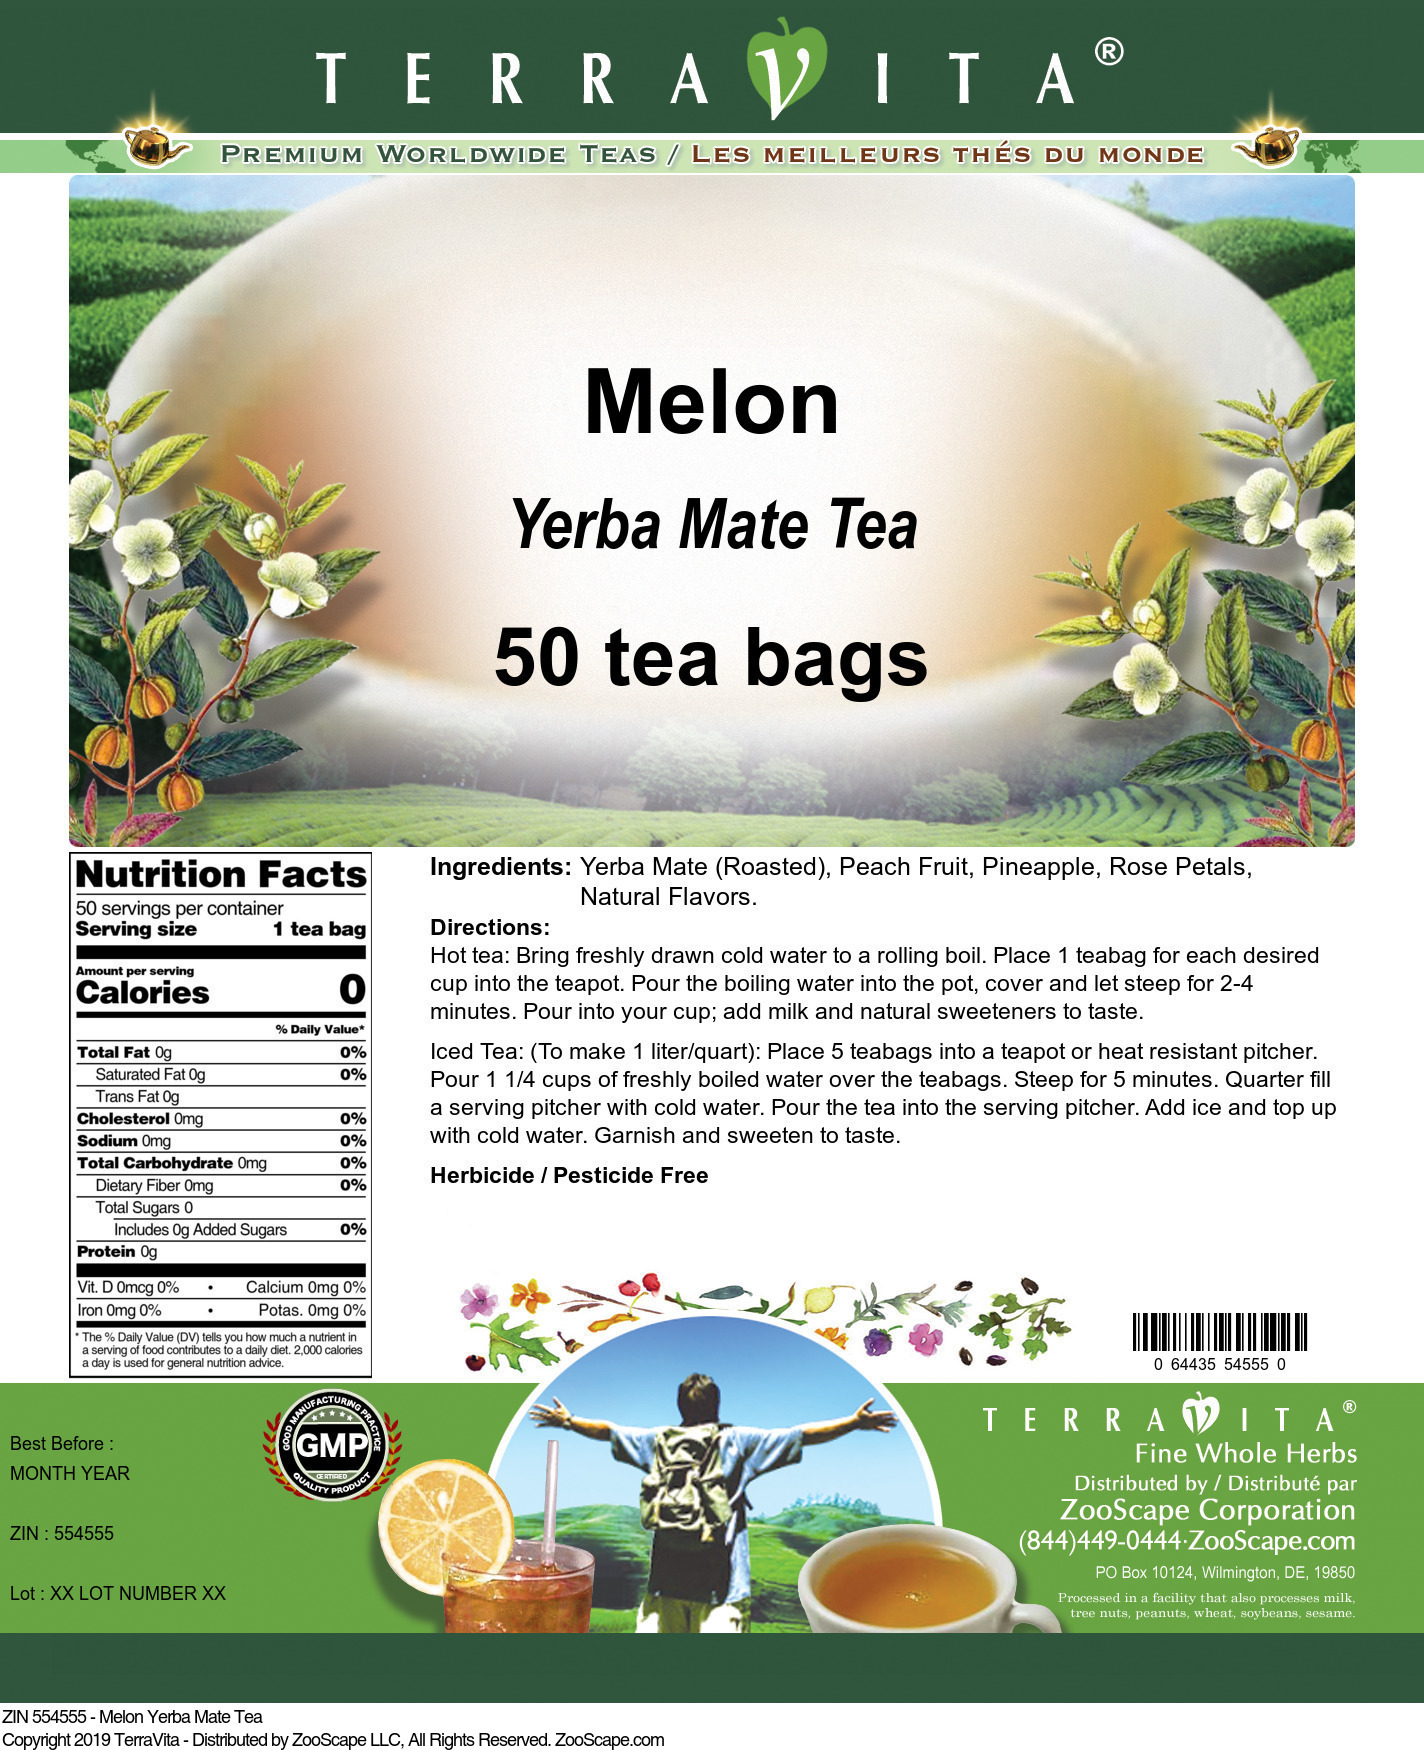 Melon Yerba Mate